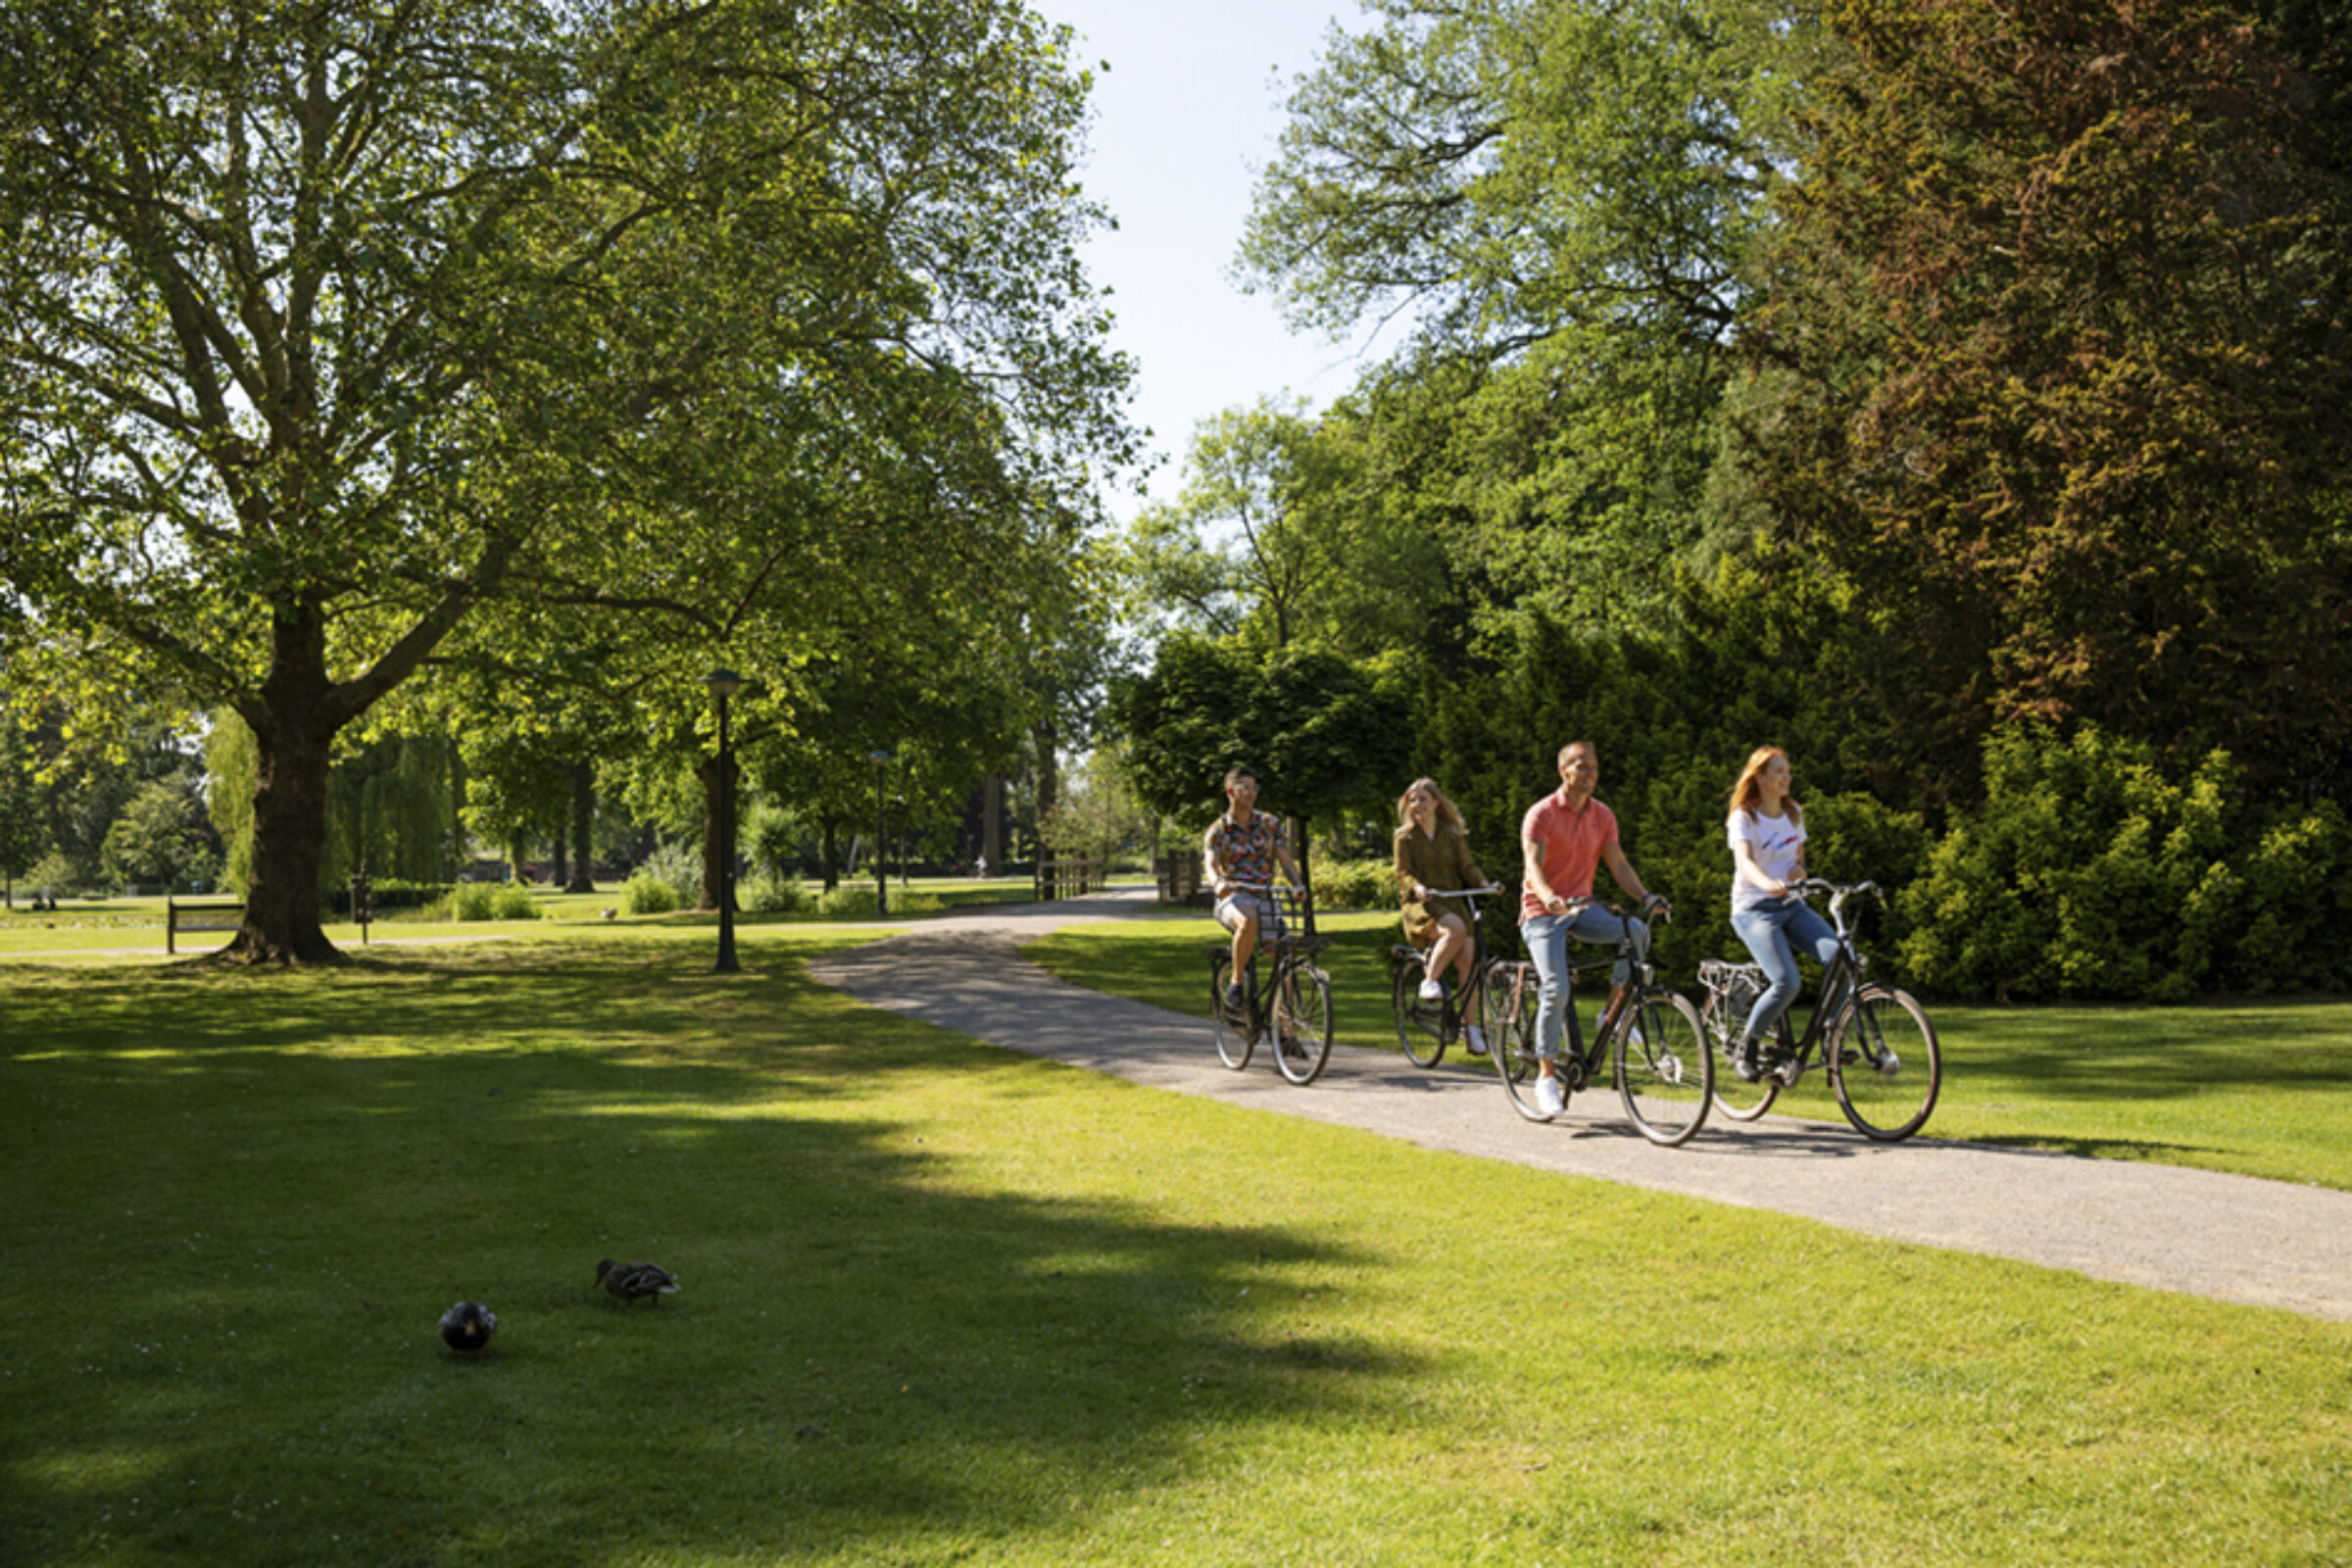 2019 Ebo Fraterman fietsen Volkspark 1 klein